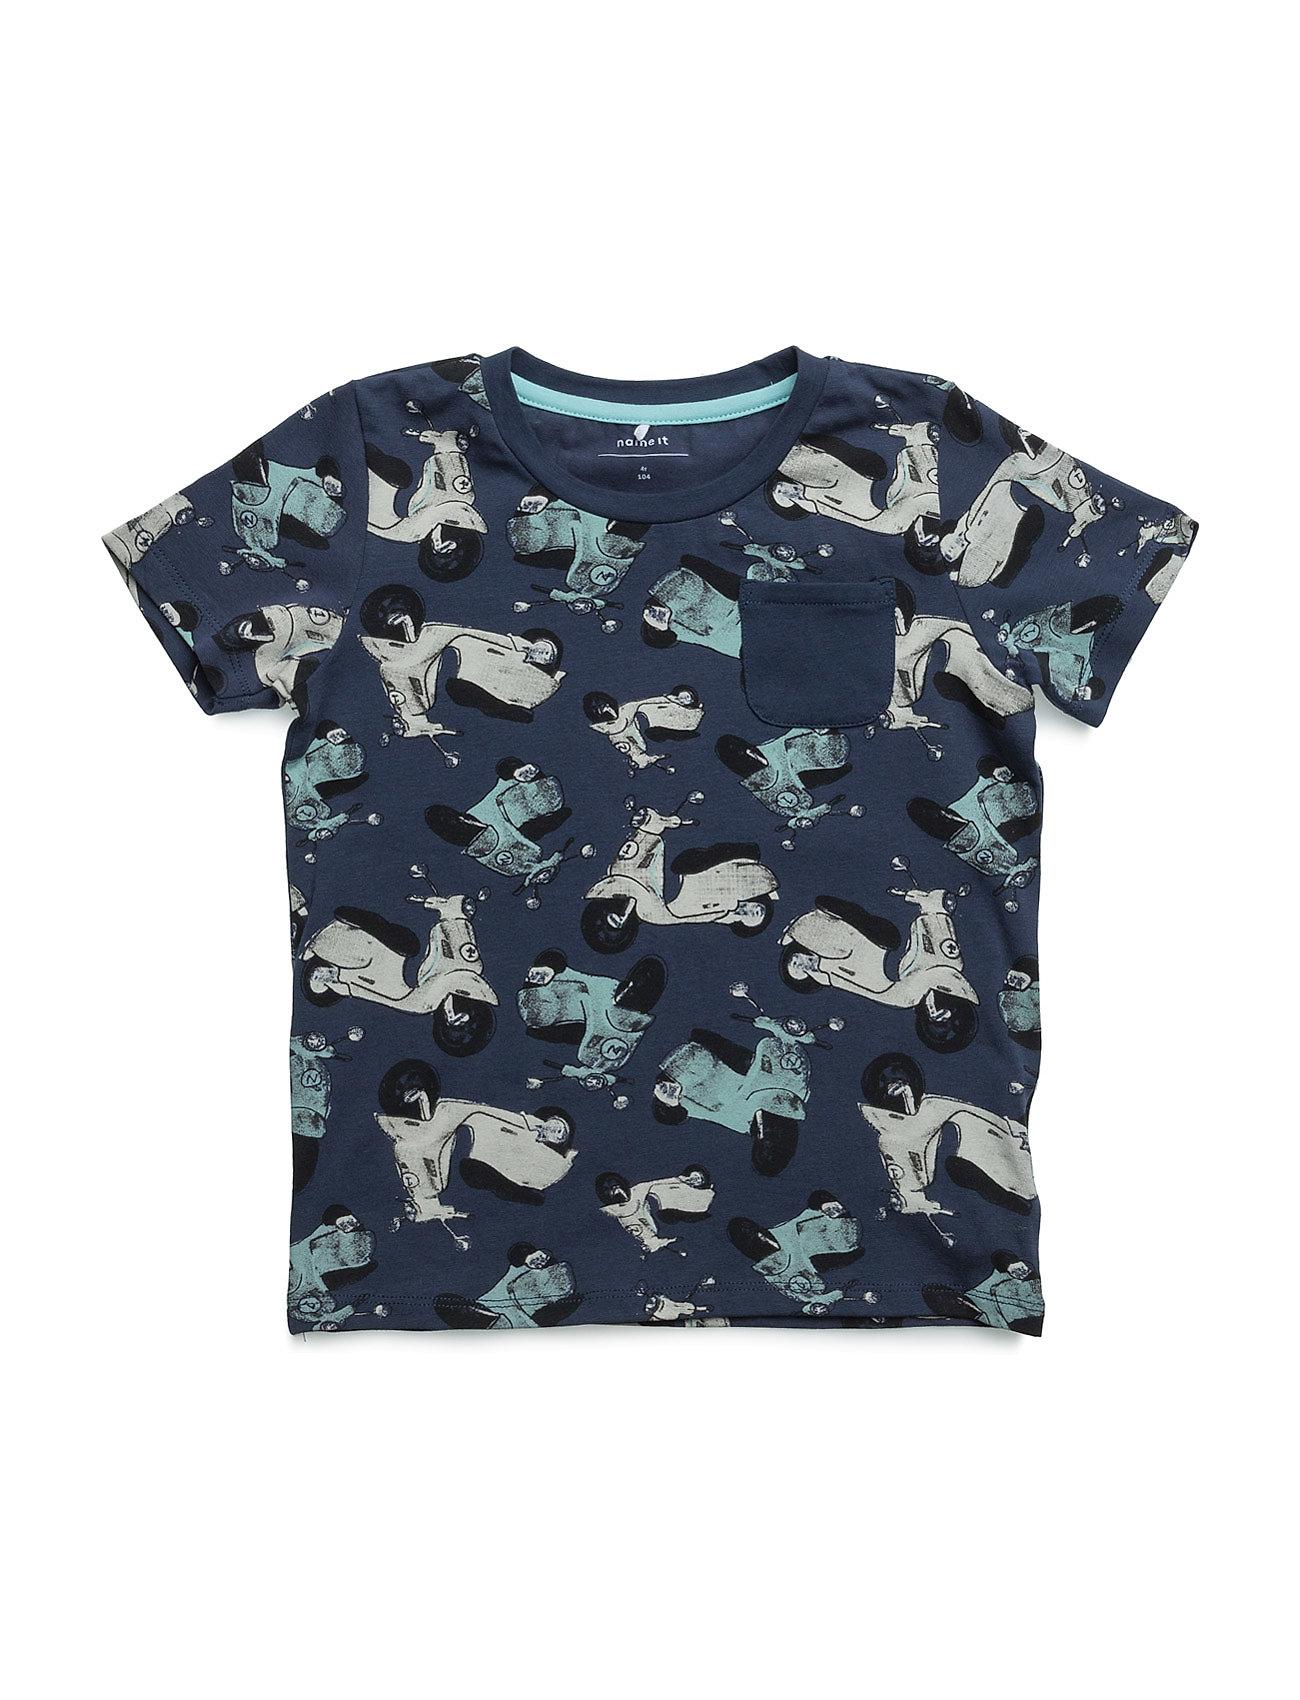 Nitebikeraop Ss Top Mz name it Kortærmede t-shirts til Børn i